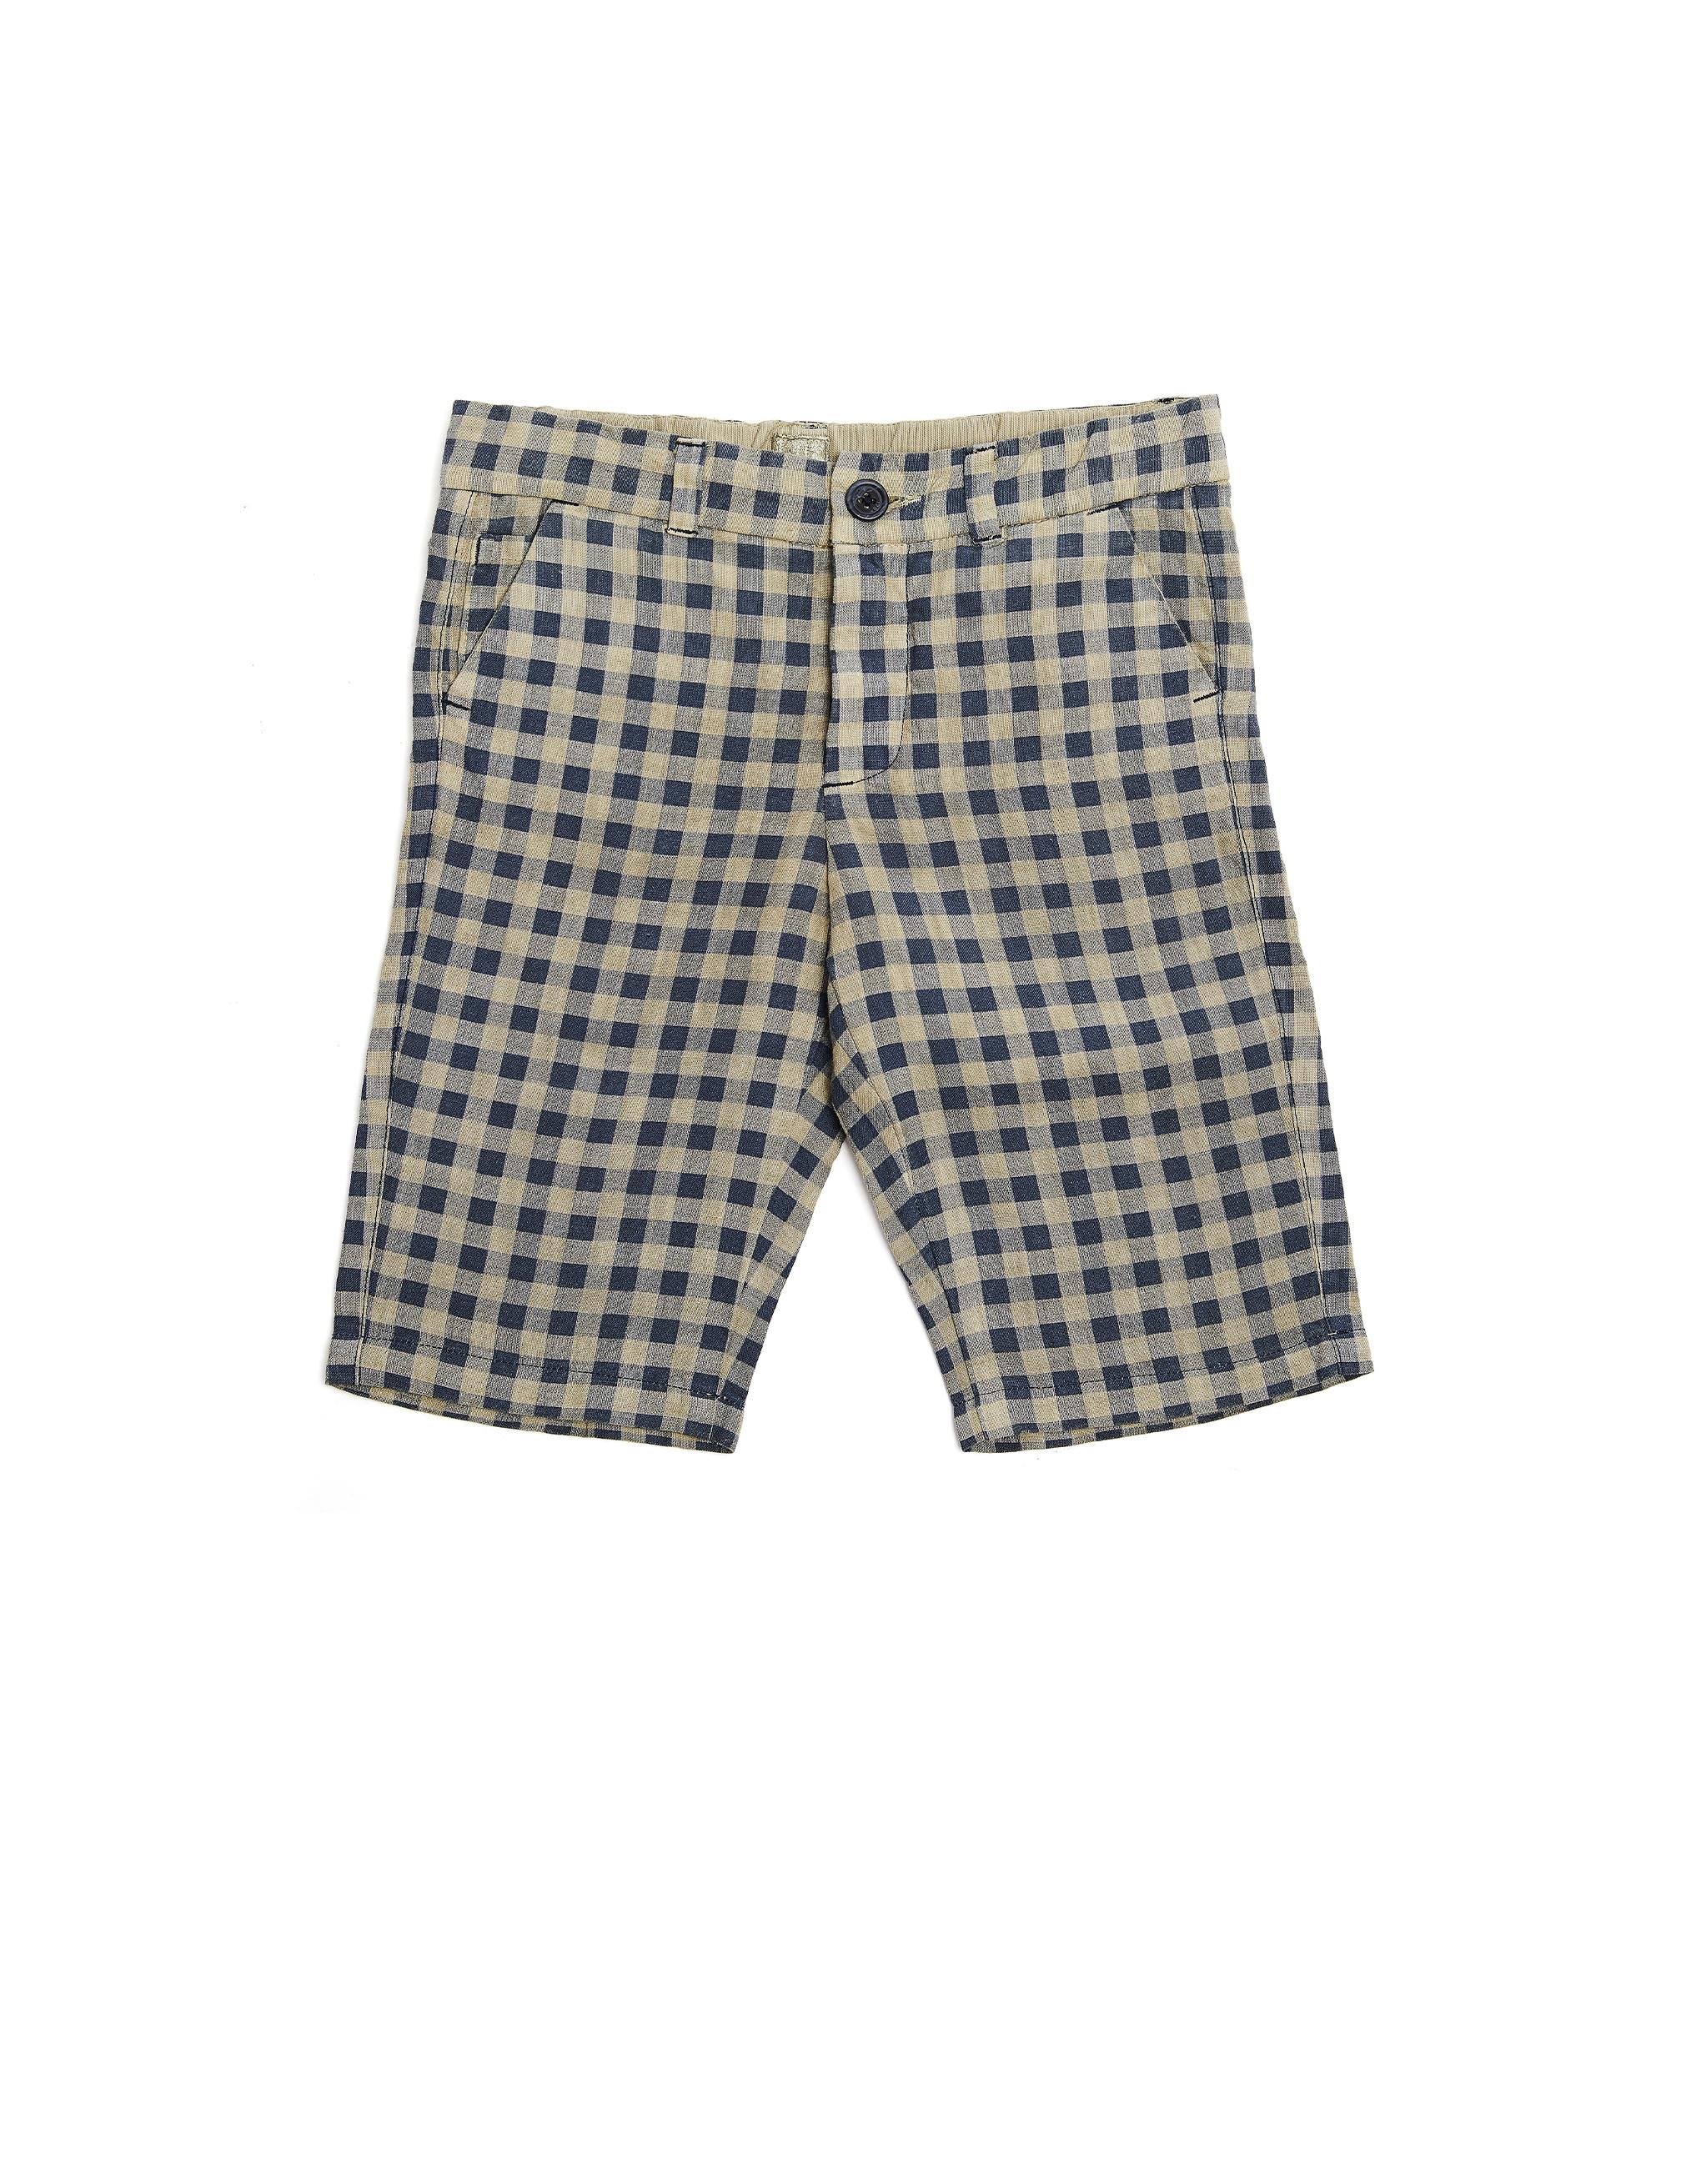 120% Lino Kids Linen Shorts